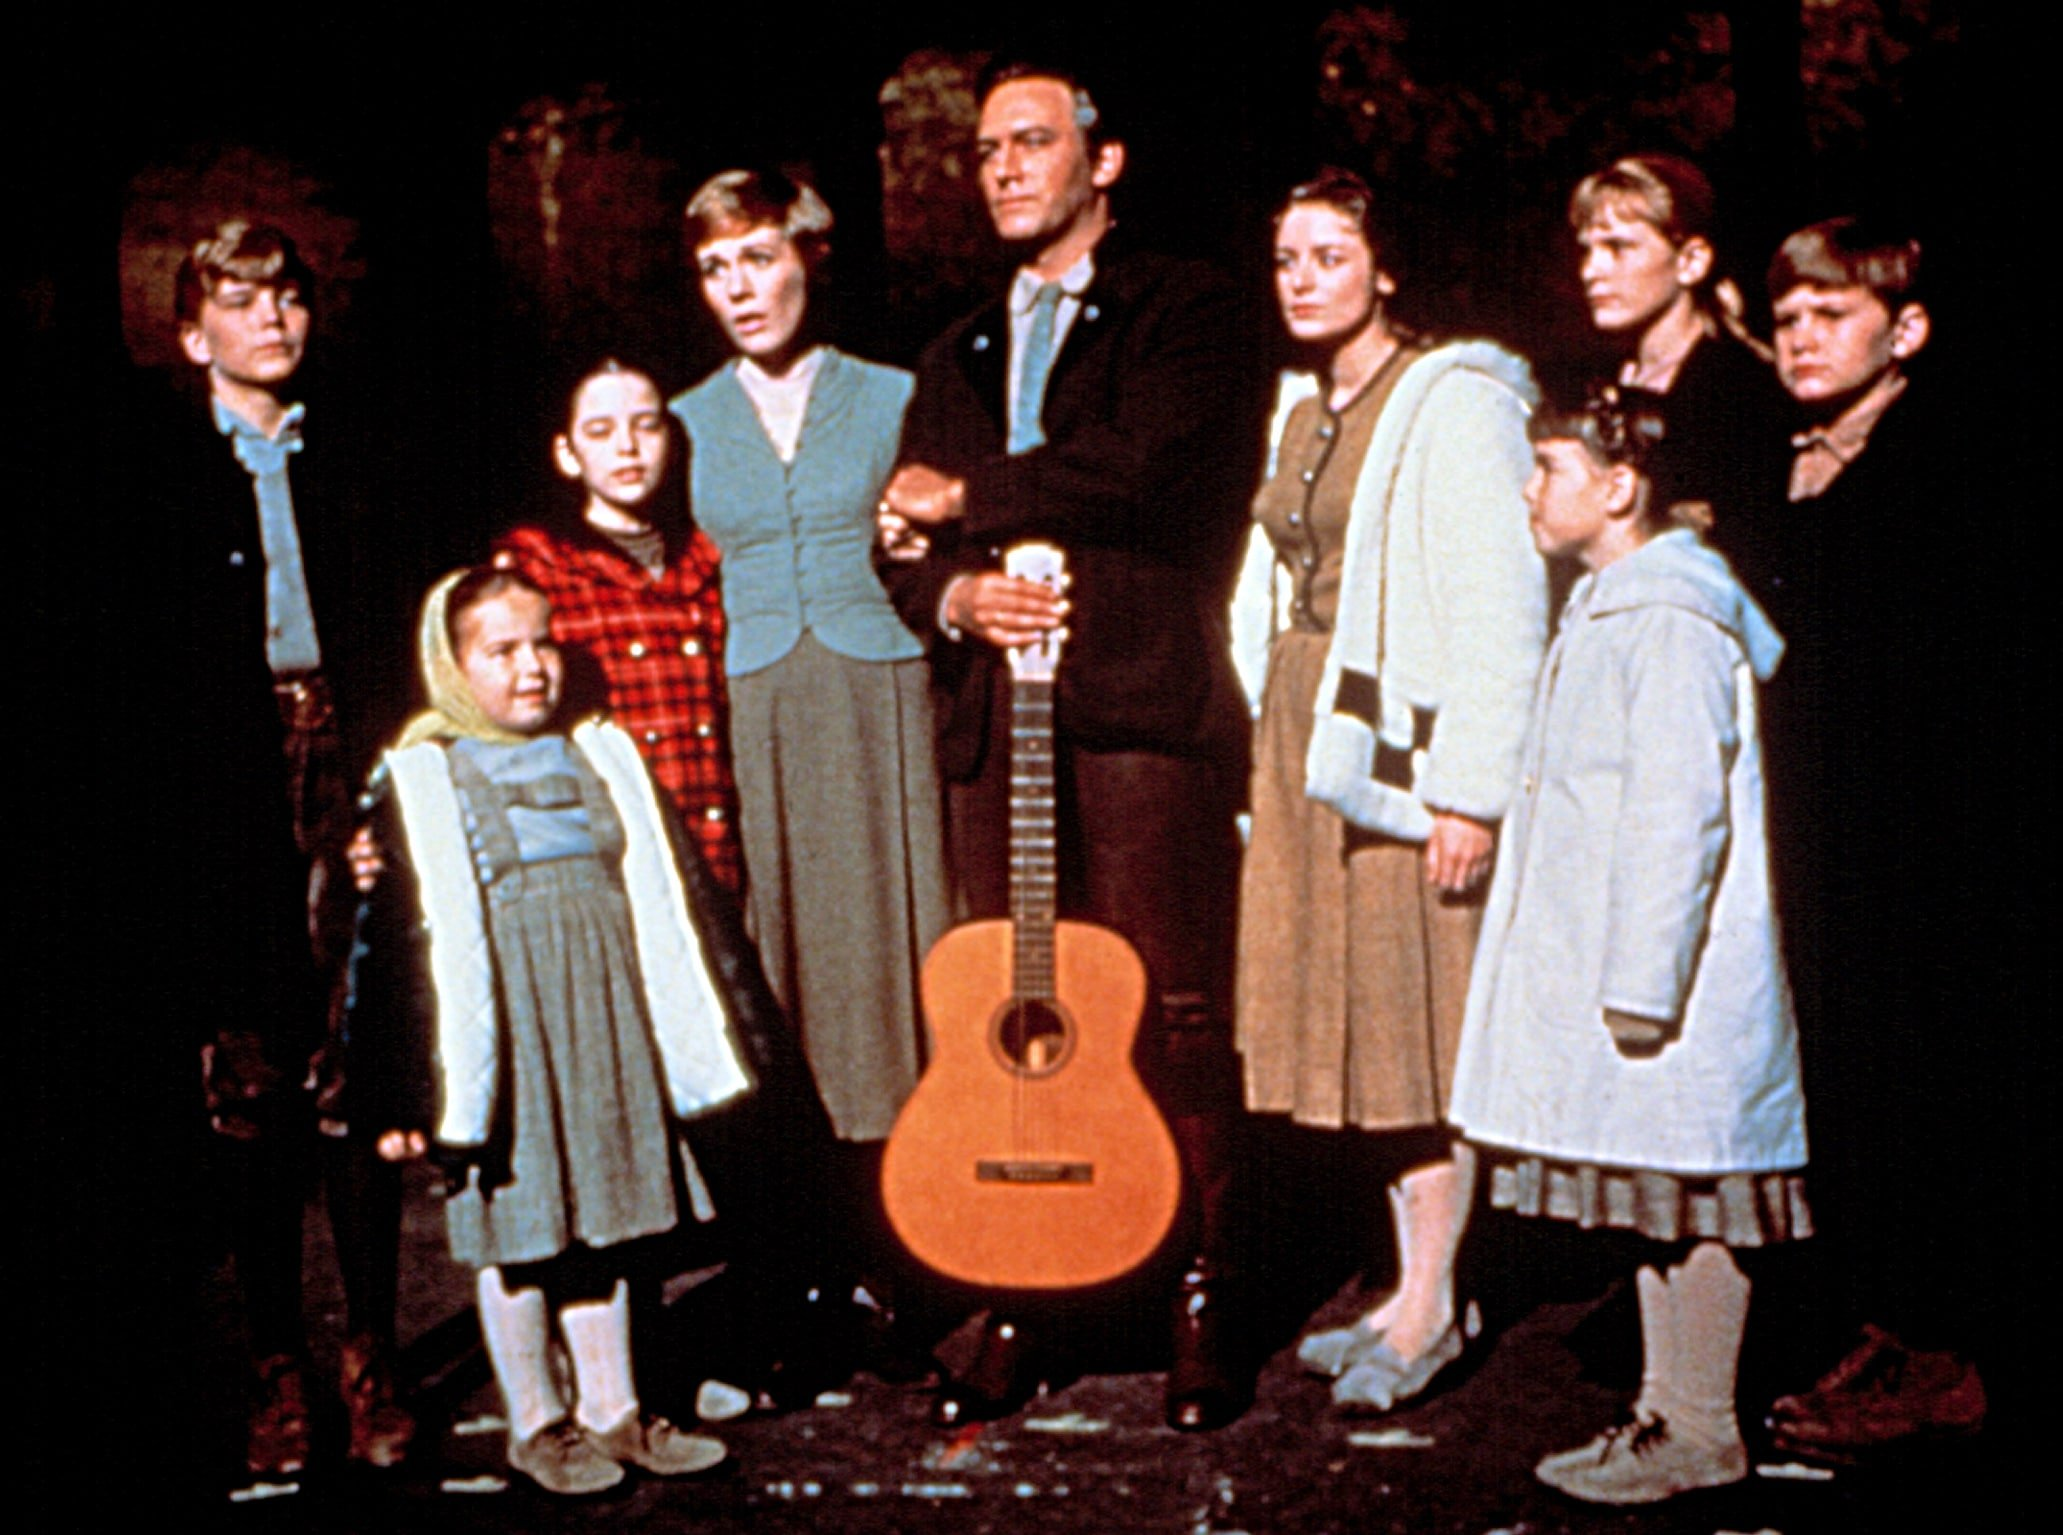 THE SOUND OF MUSIC, Julie Andrews, Christopher Plummer